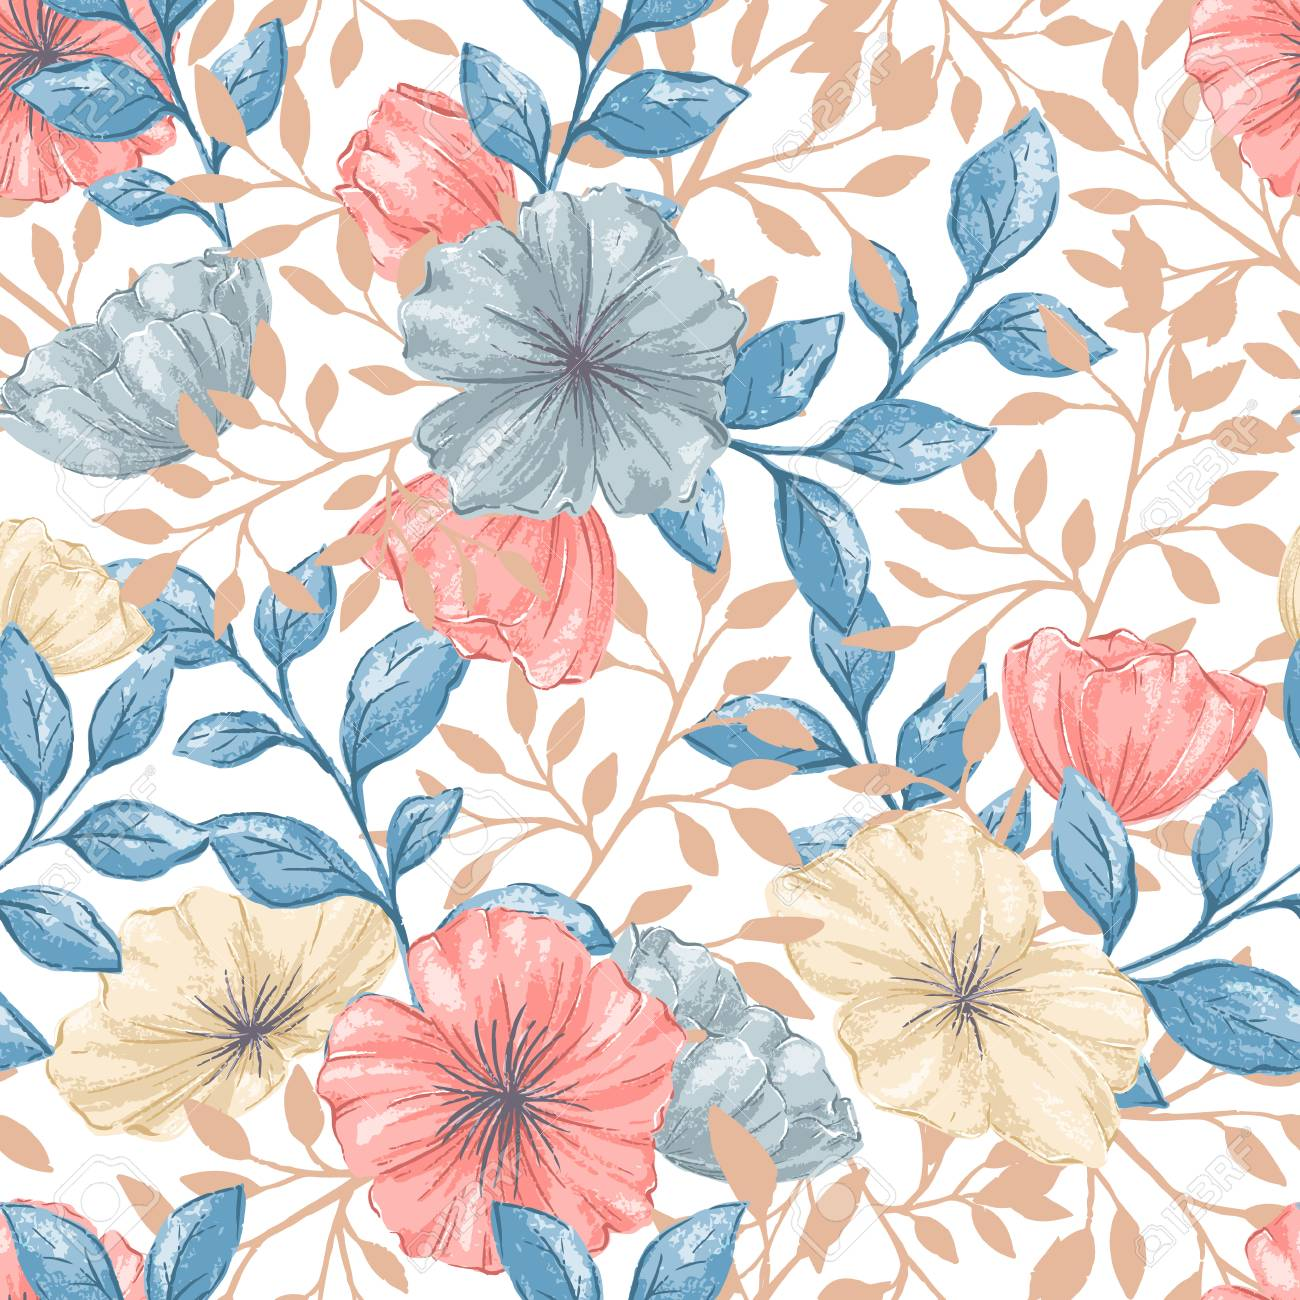 A Seamless Retro pattern on plain background. - 91414730